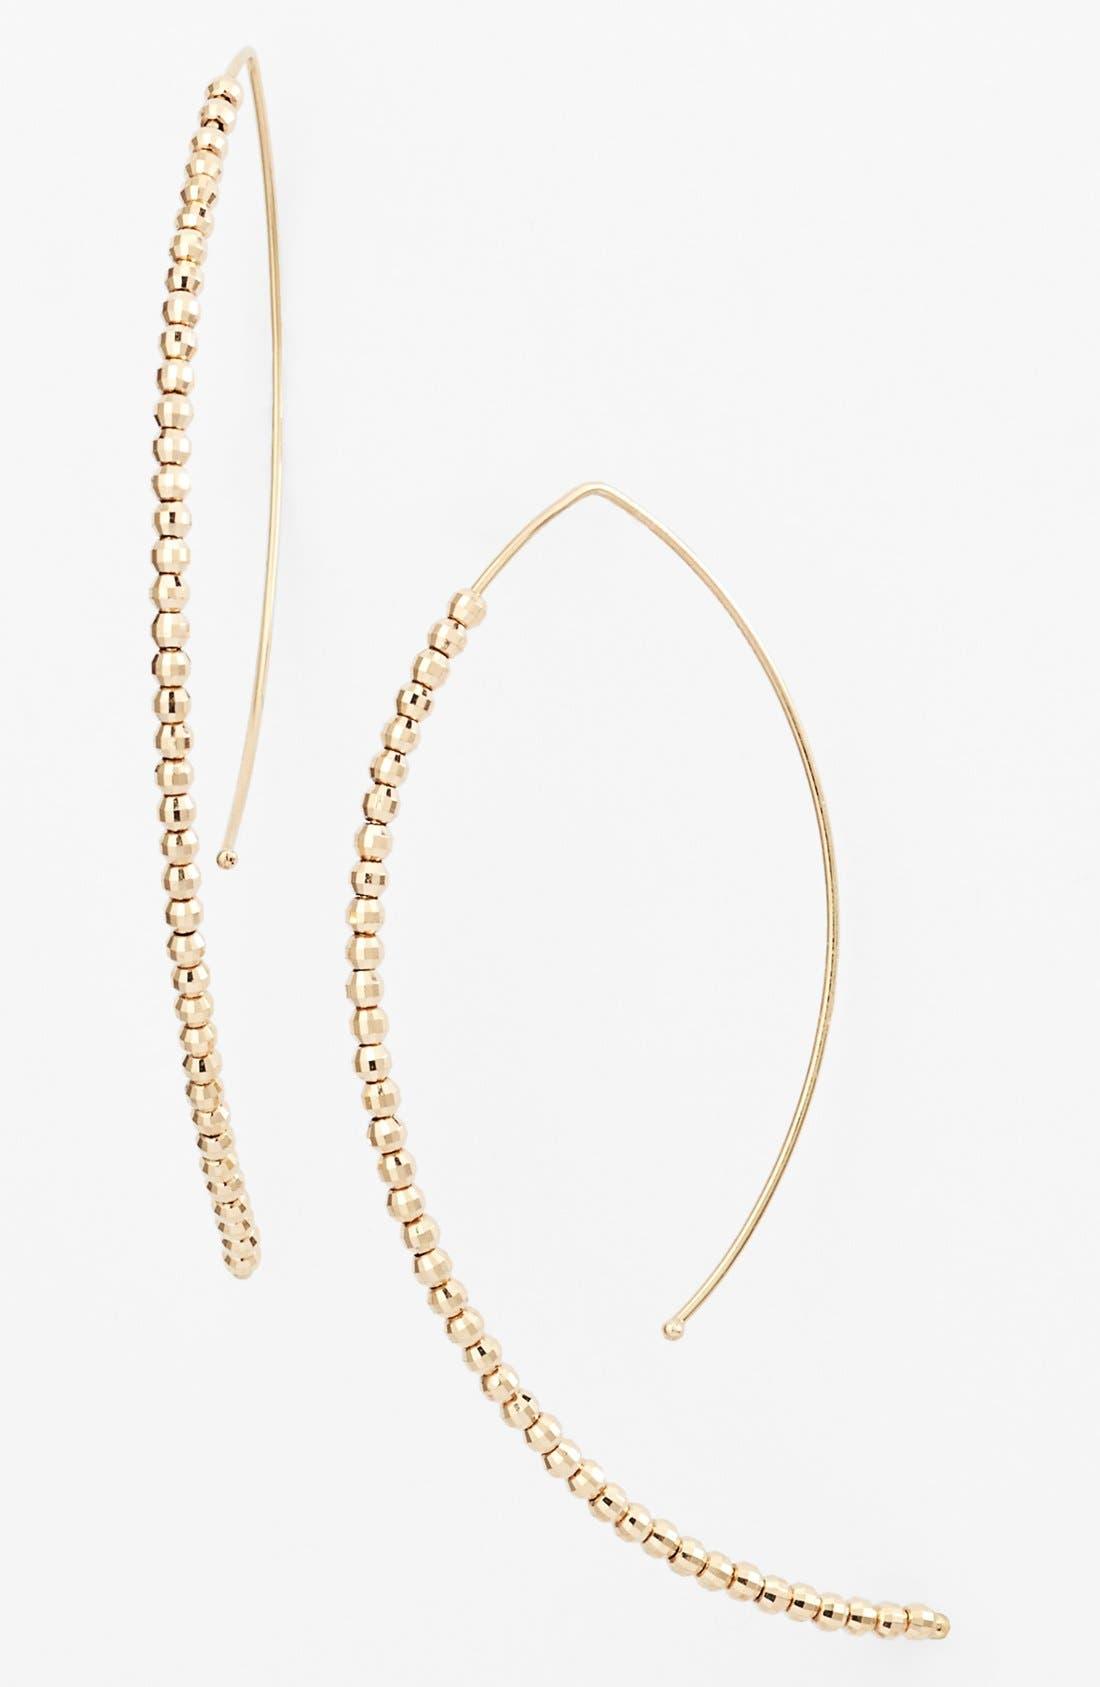 Main Image - Mizuki 'Cut Beads' Open Hoop Earrings